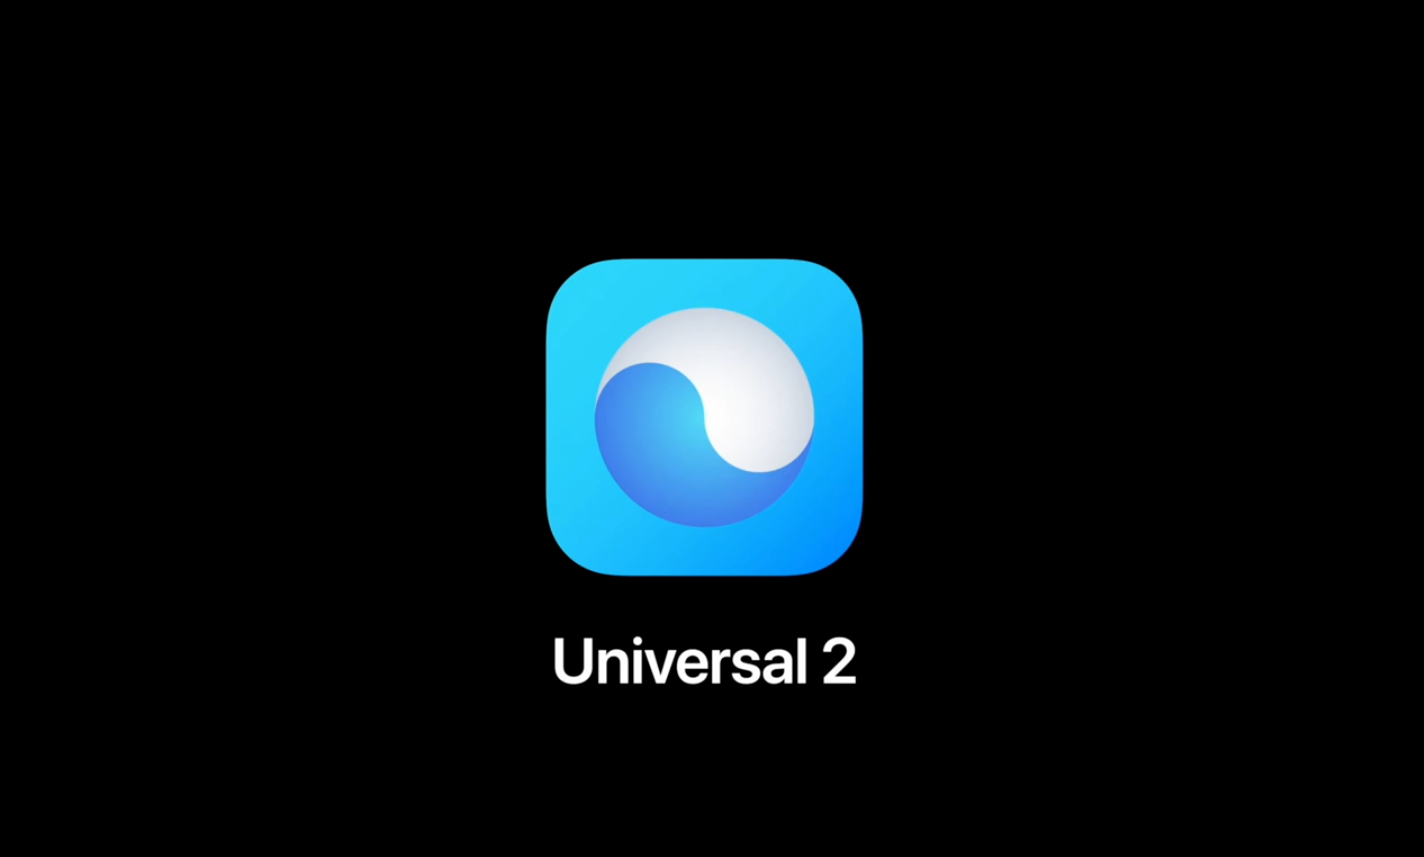 Apple Rosetta 2 emulation - hero image